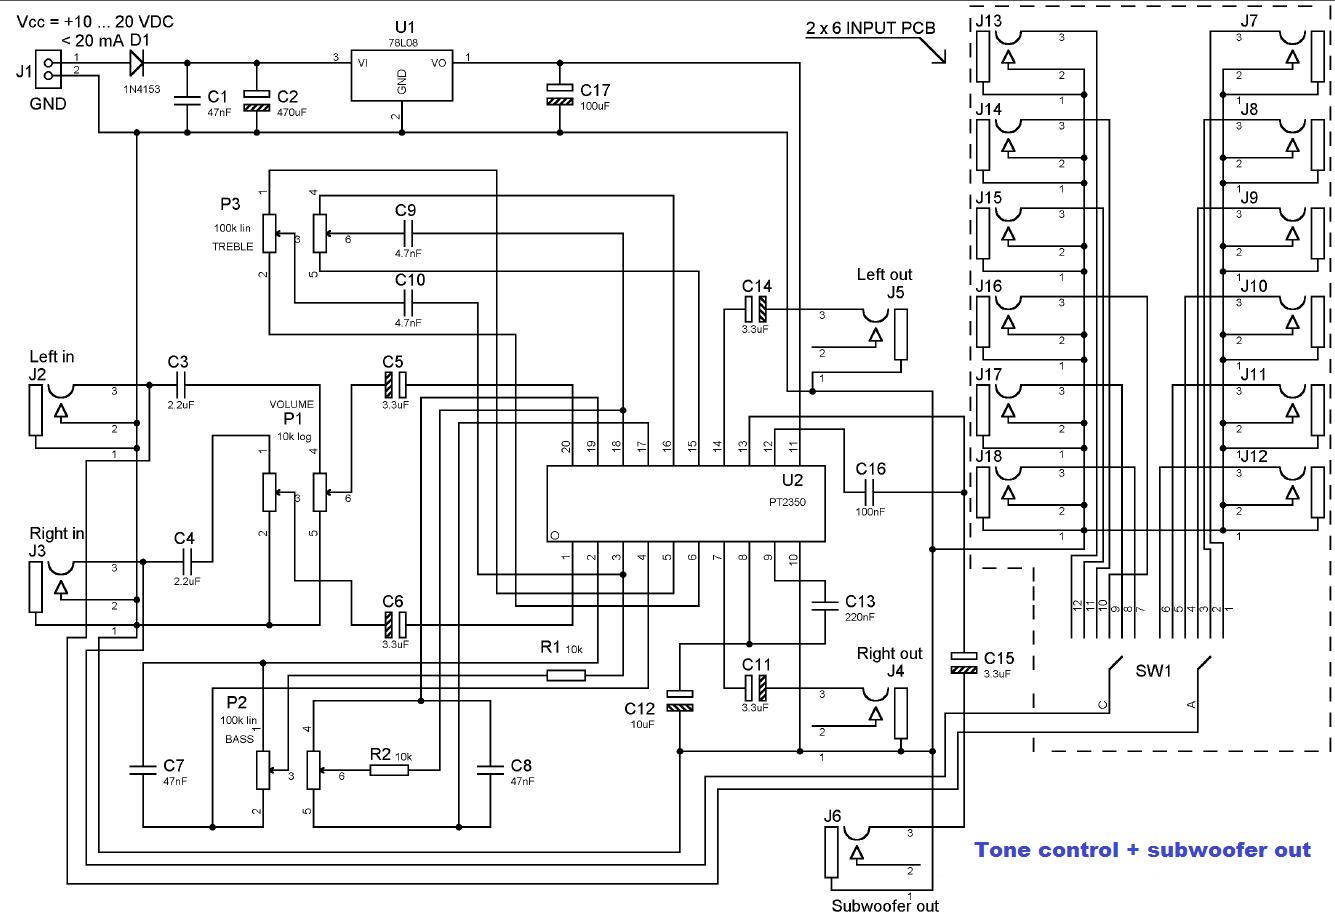 kicker dual ohm wiring diagram kicker discover your wiring 2 1 ohm speaker wiring diagram wiring diagram ohm dual voice coil sub images subwoofer [ 1335 x 917 Pixel ]